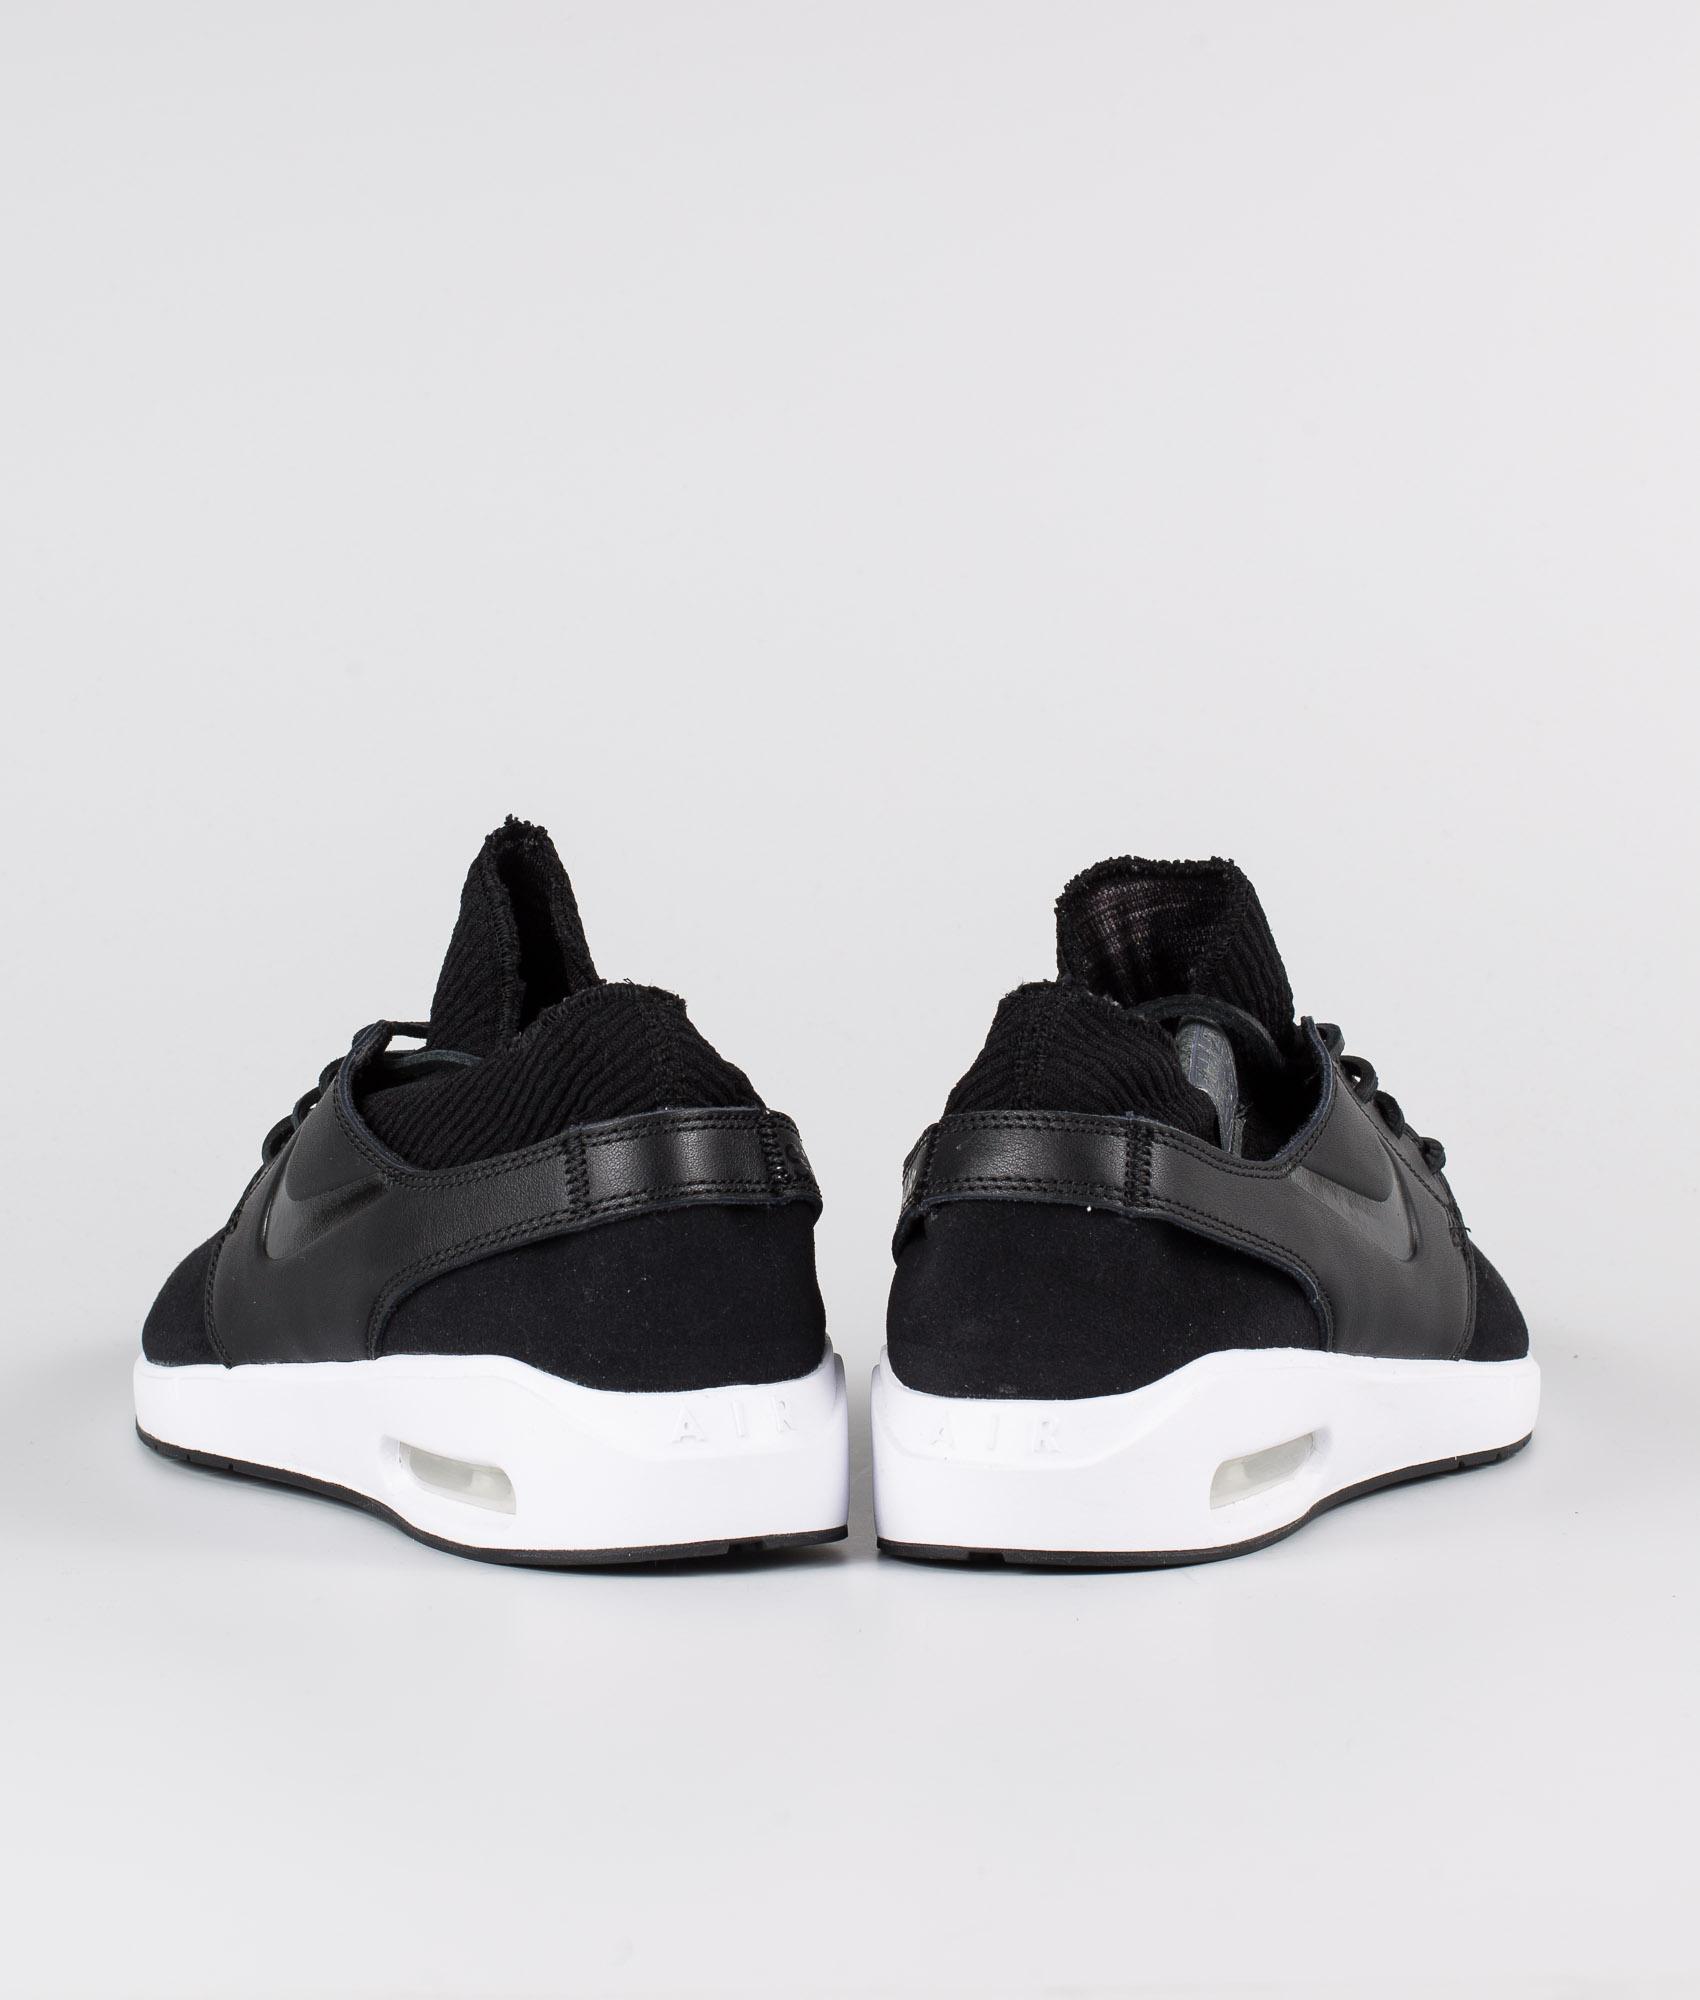 2 SB Air Premium Max Janoski Nike Grey BlackBlack Thunder Schuhe Nike Black 8Pm0ynOvNw